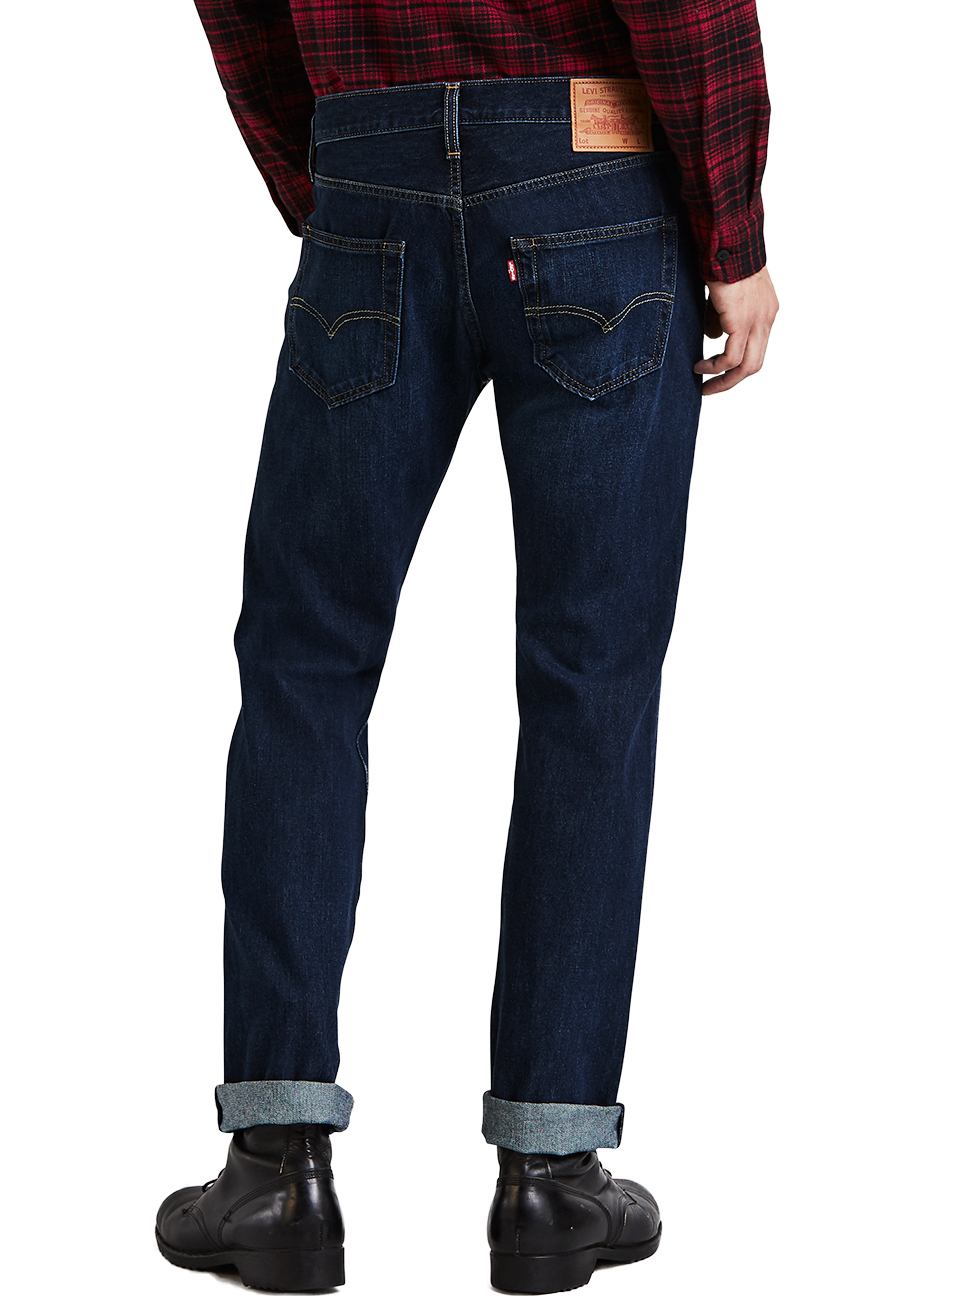 levis-herren-jeans-501-original-fit-blau-sponge-st